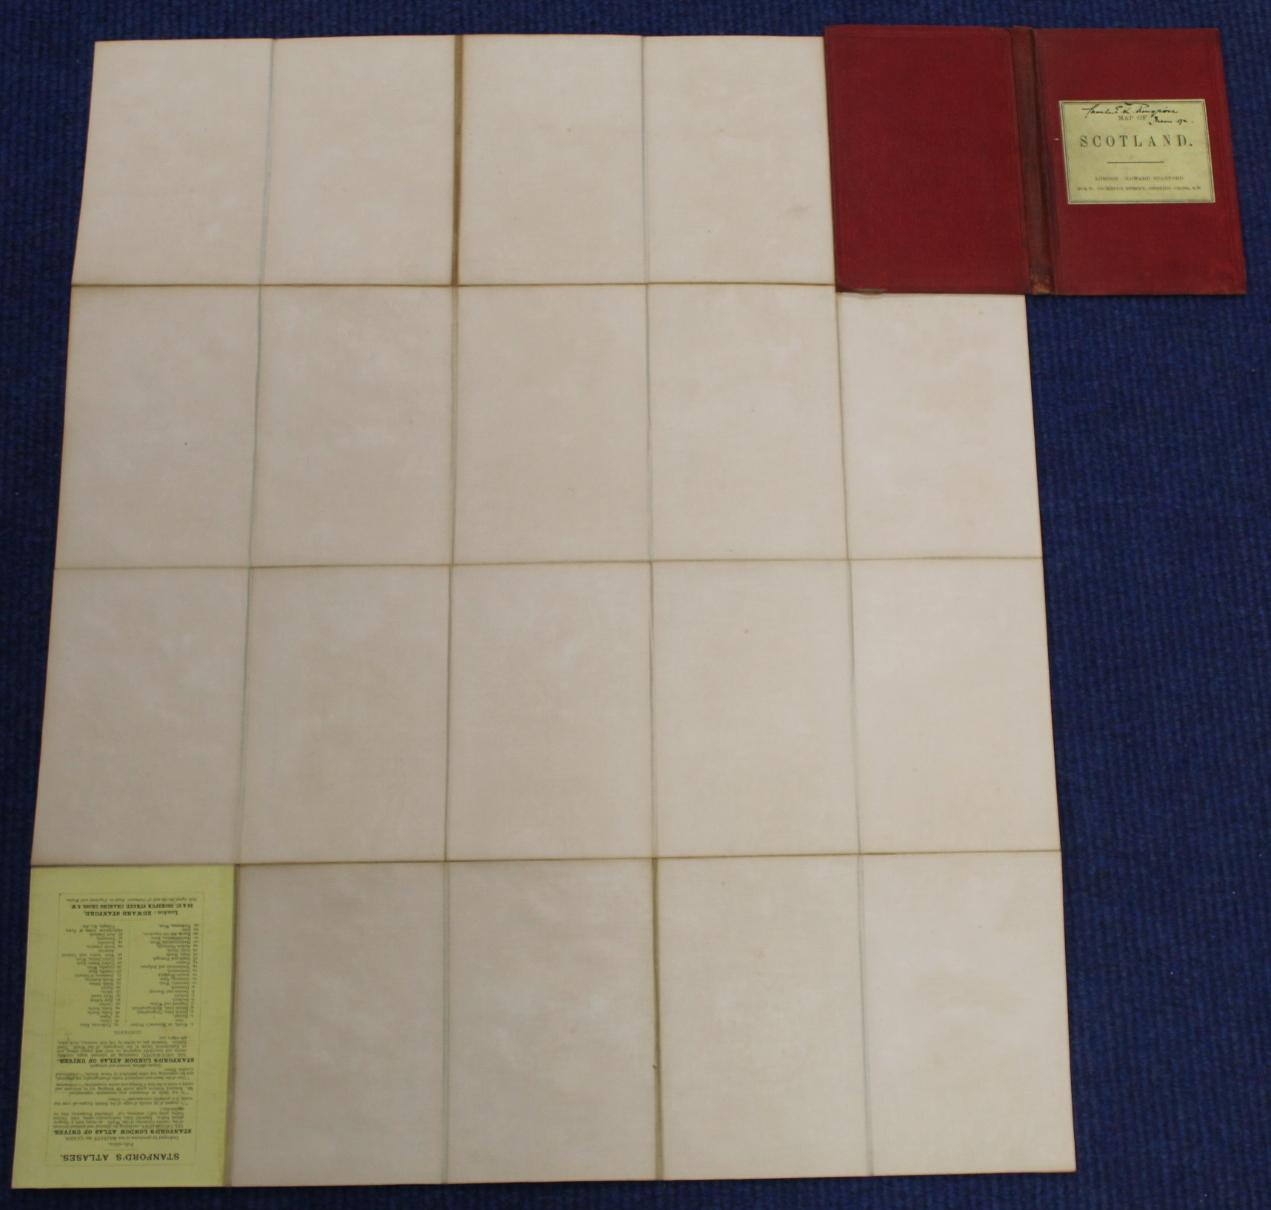 KIRKWOOD J. & SONS.Map of Scotland. Hand col. eng. fldg. linen map in well worn orig. slip case. - Image 24 of 36